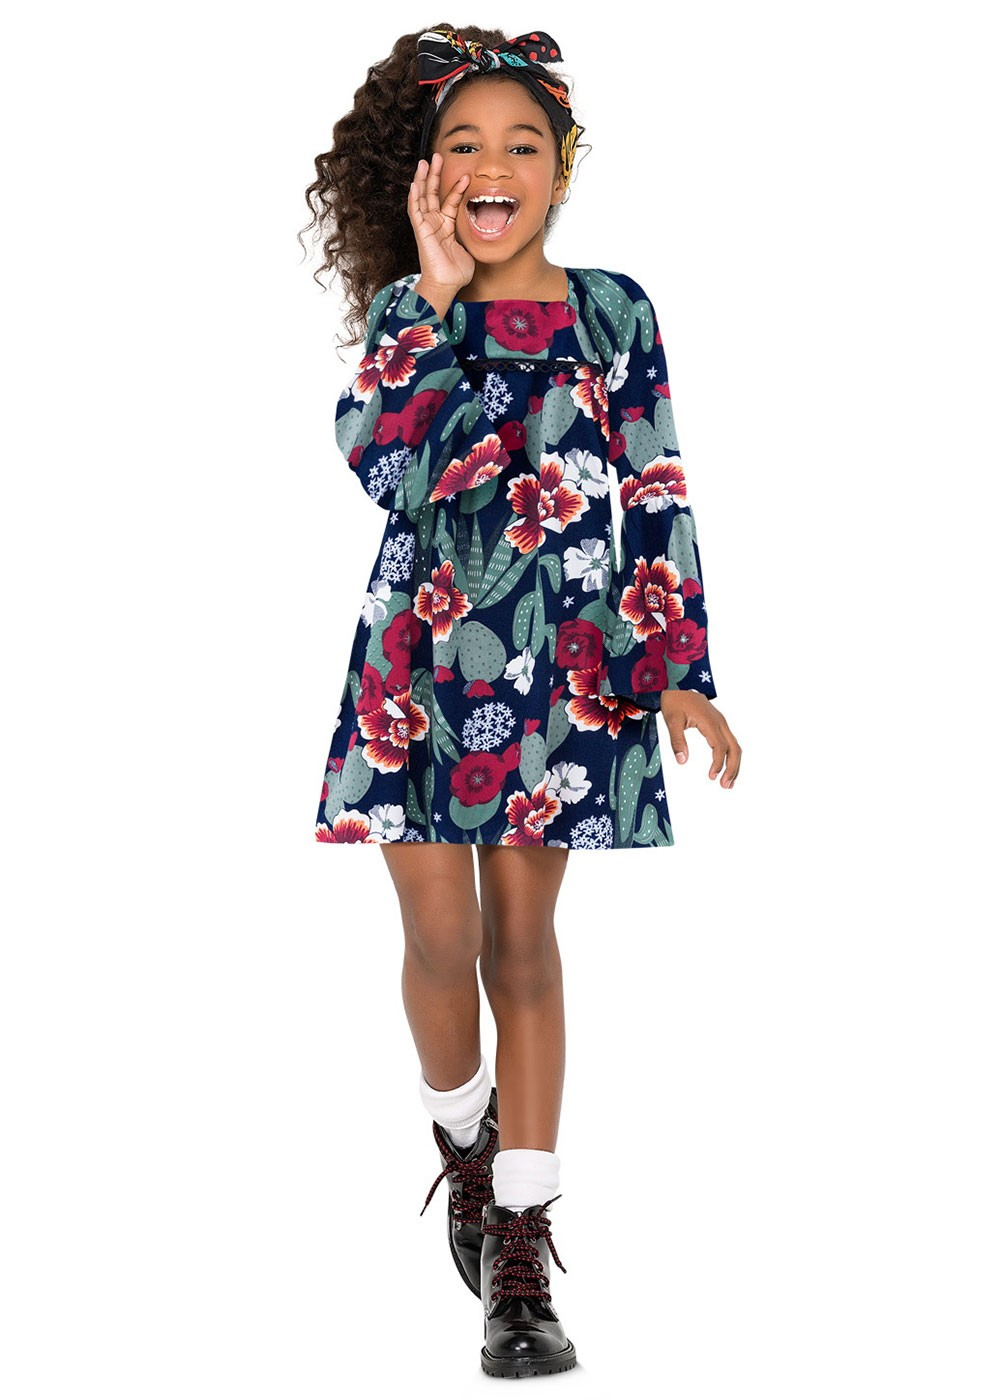 Vestido Infantil Feminino Azul Florido Inverno Nanai